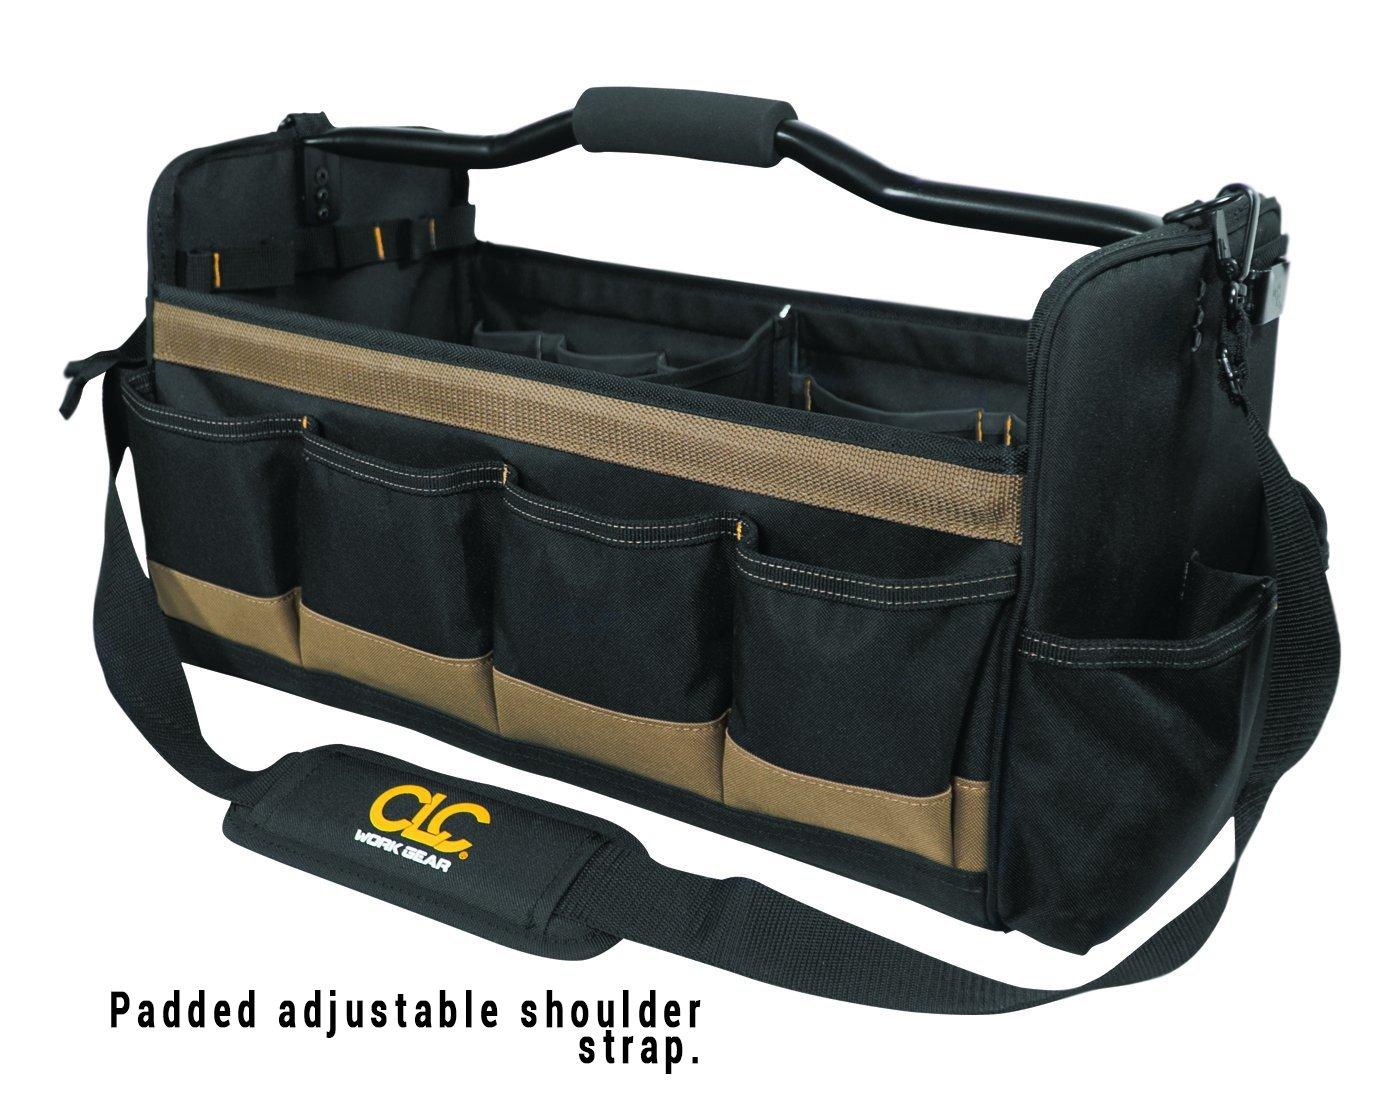 CLC Custom Leathercraft 1579 20 Inch, Open Top, Soft Sided Tool Box, 27 Pockets by Custom Leathercraft (Image #1)